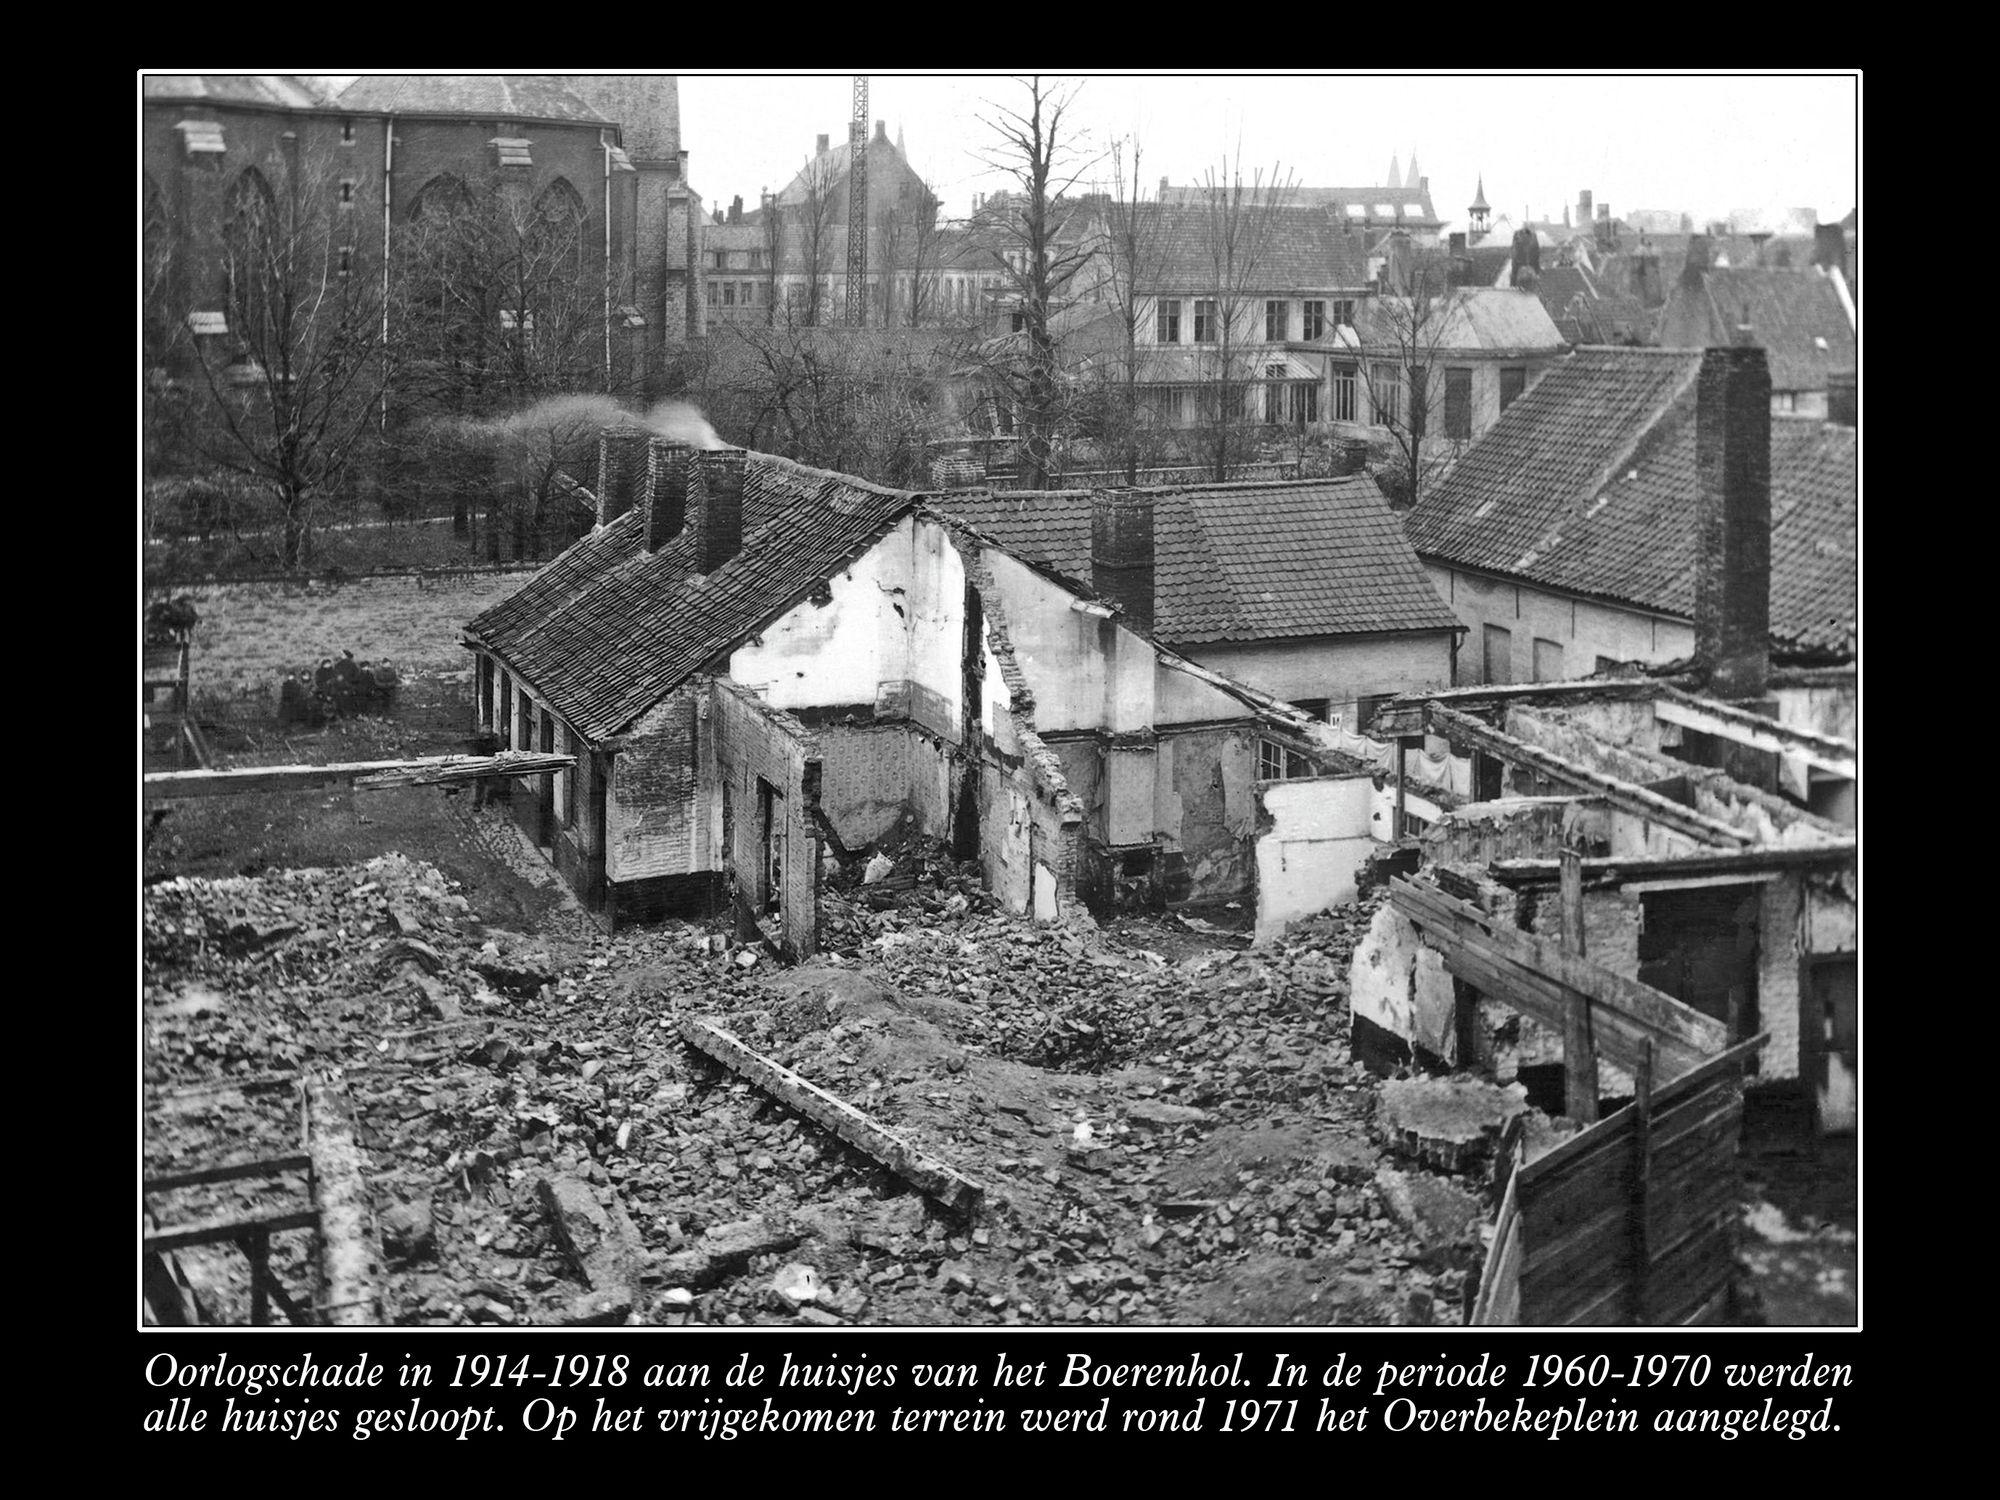 Boerenhol 1914-1918